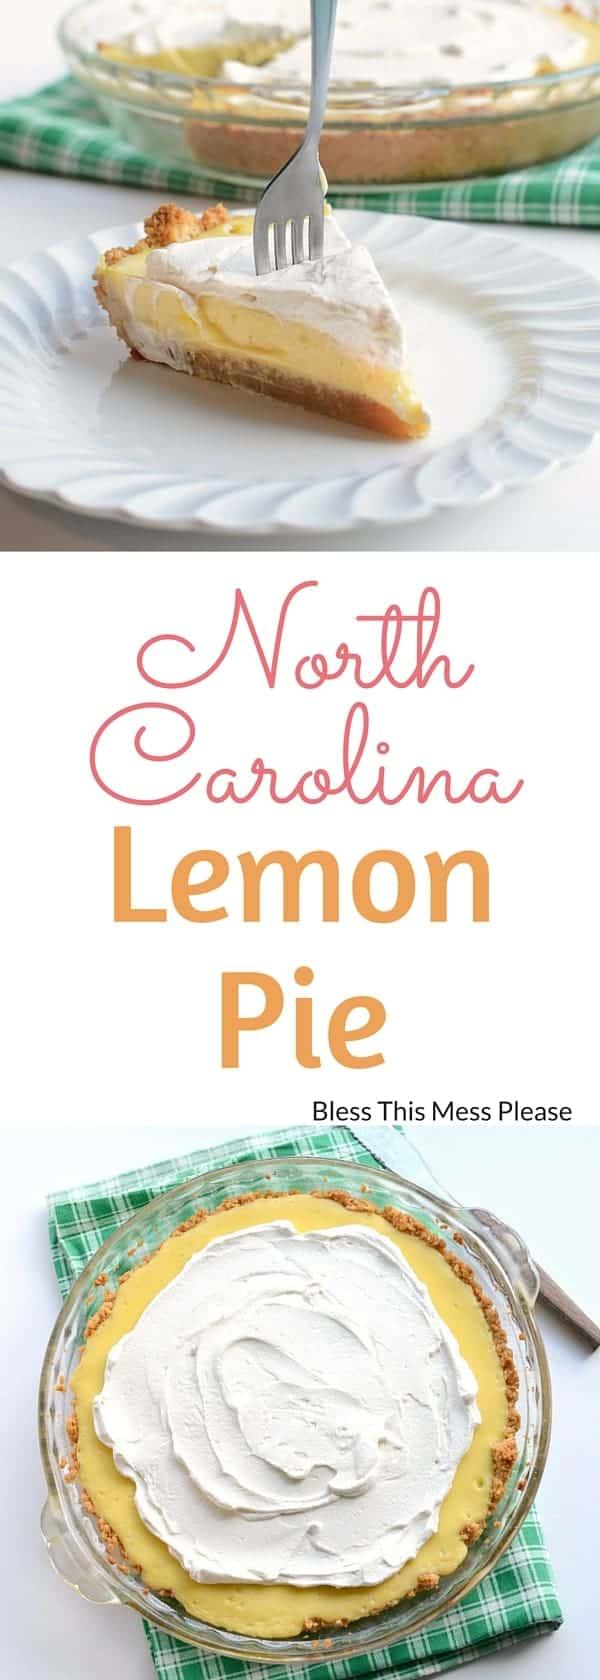 North Carolina Lemon Pie